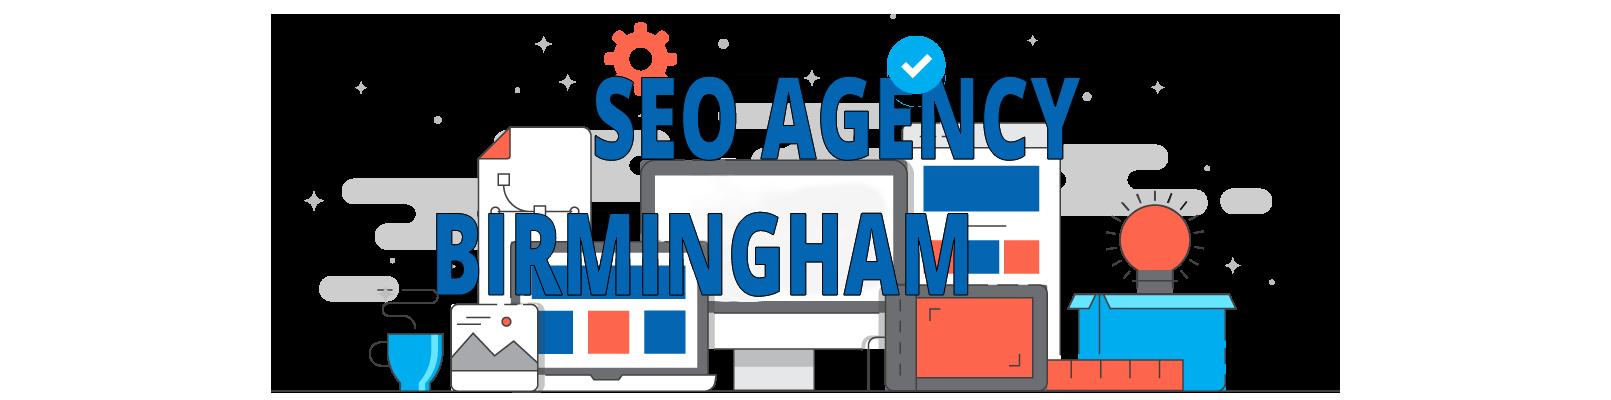 seek social seo agency birmingham header with transparent background